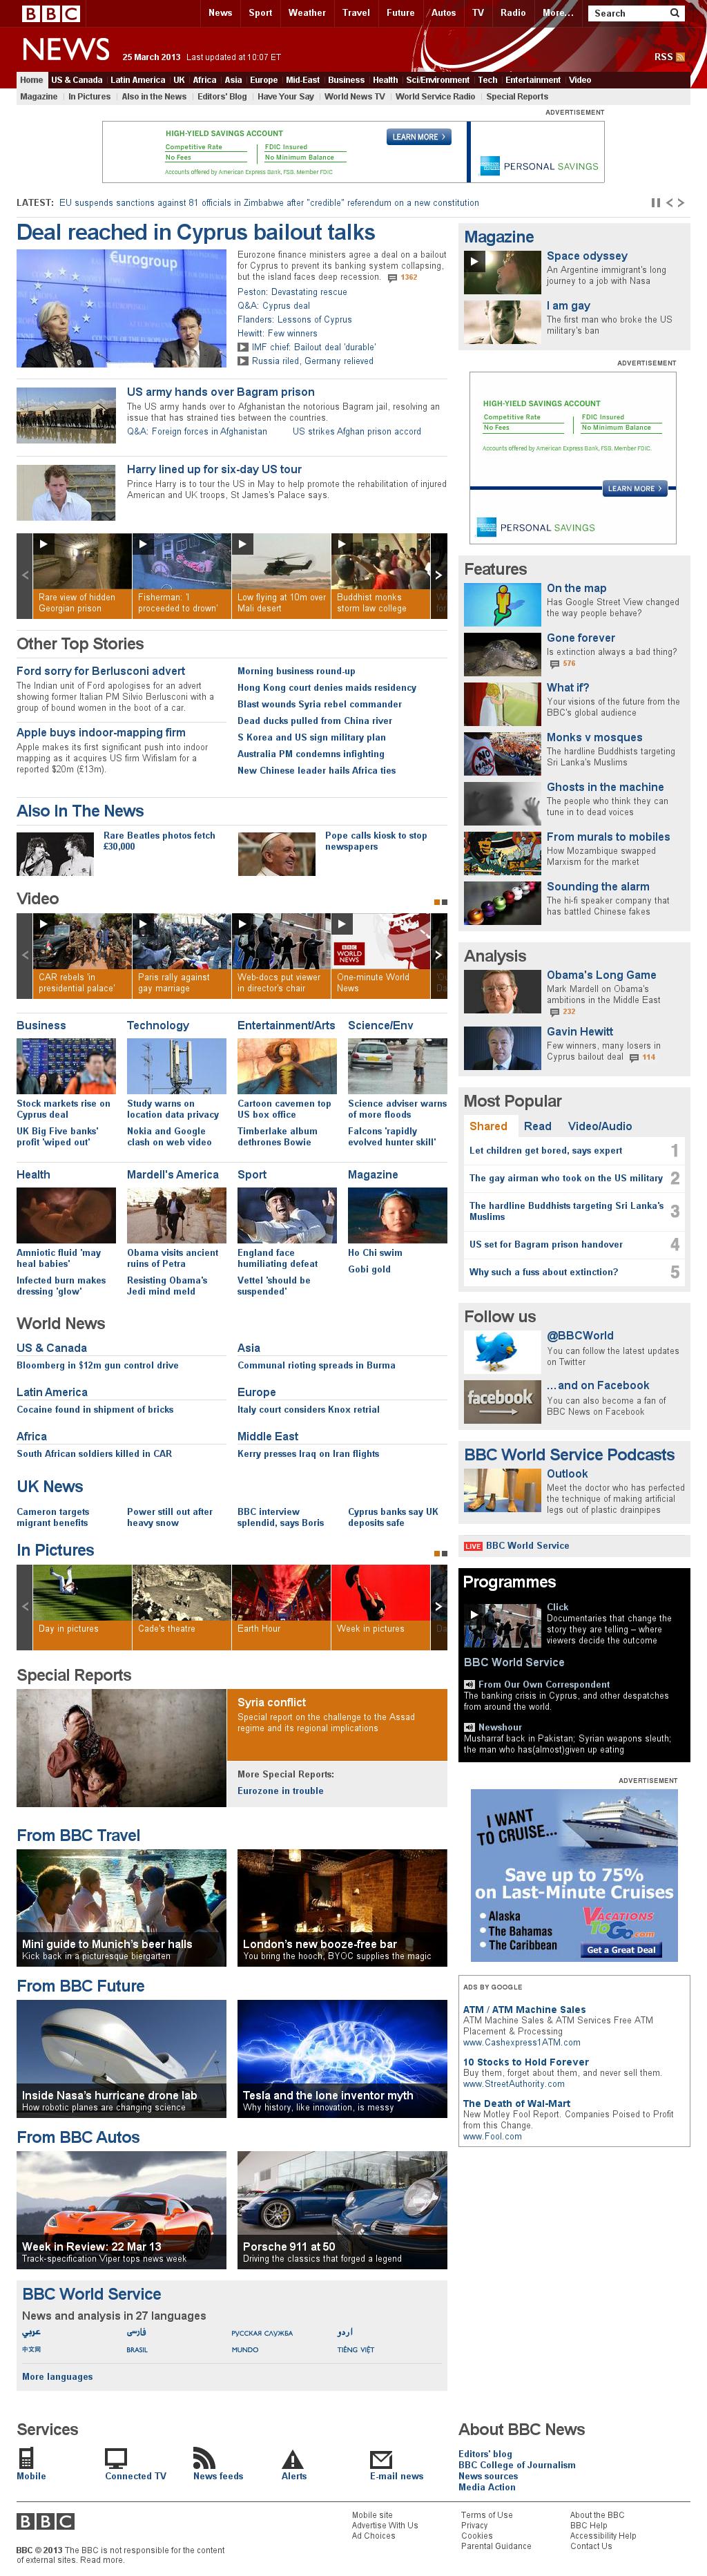 BBC at Monday March 25, 2013, 2:10 p.m. UTC